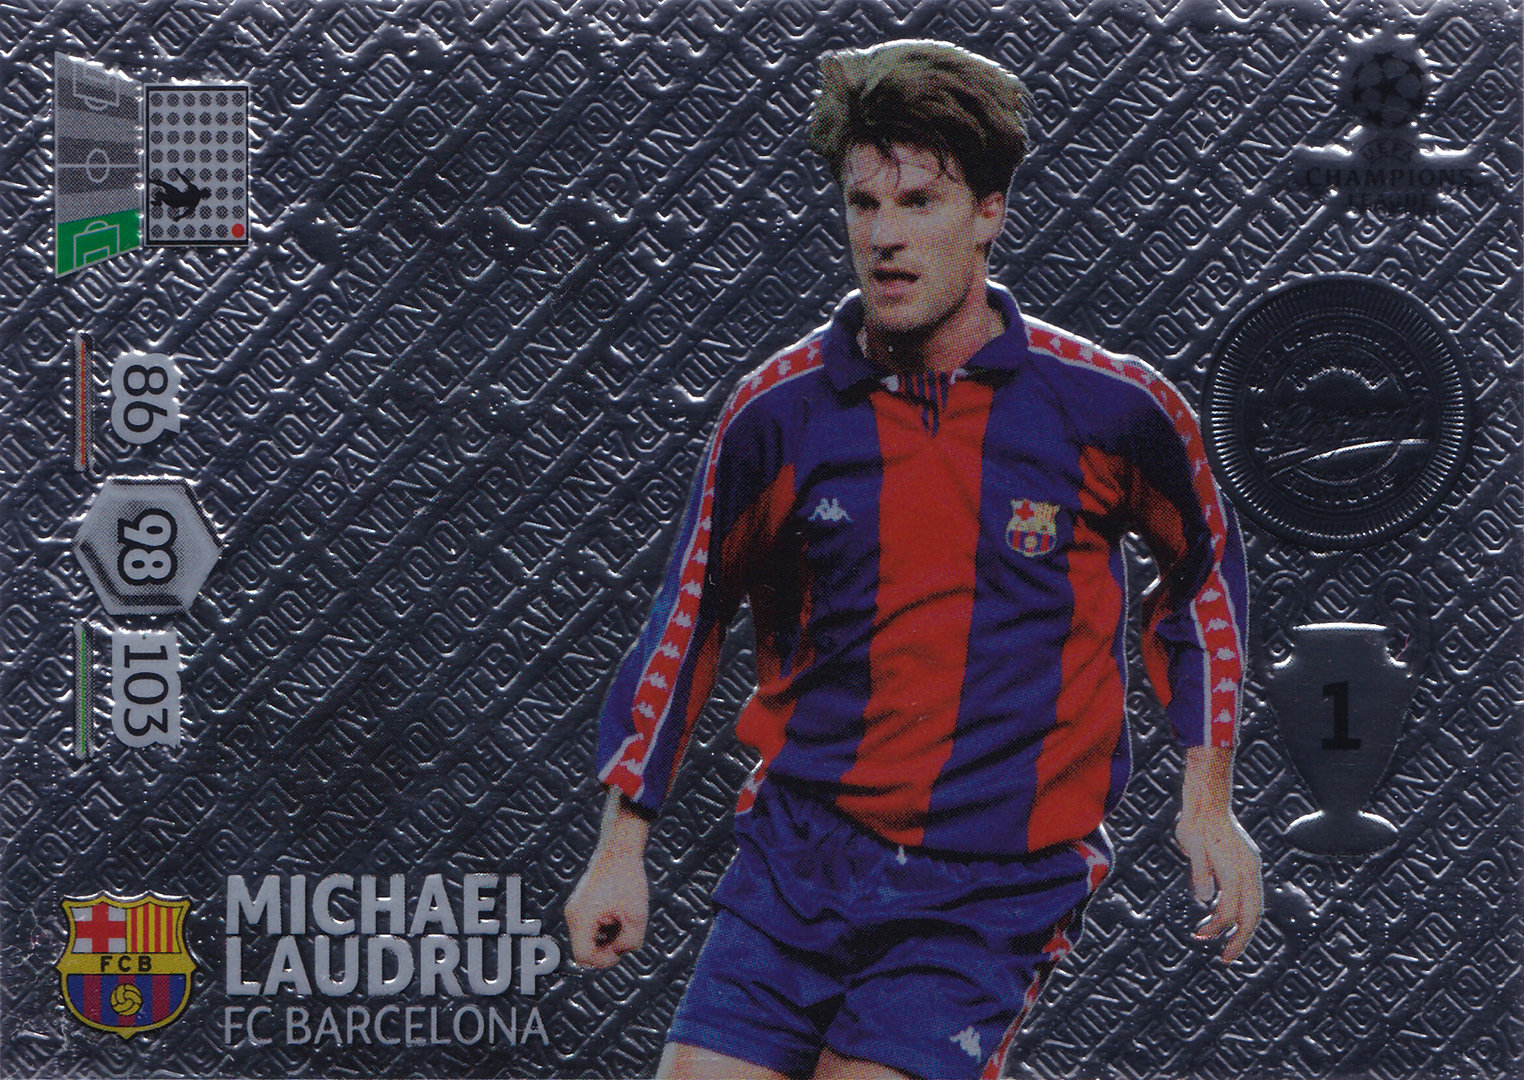 2012 13 Panini Adrenalyn XL Champions League Legend Michael